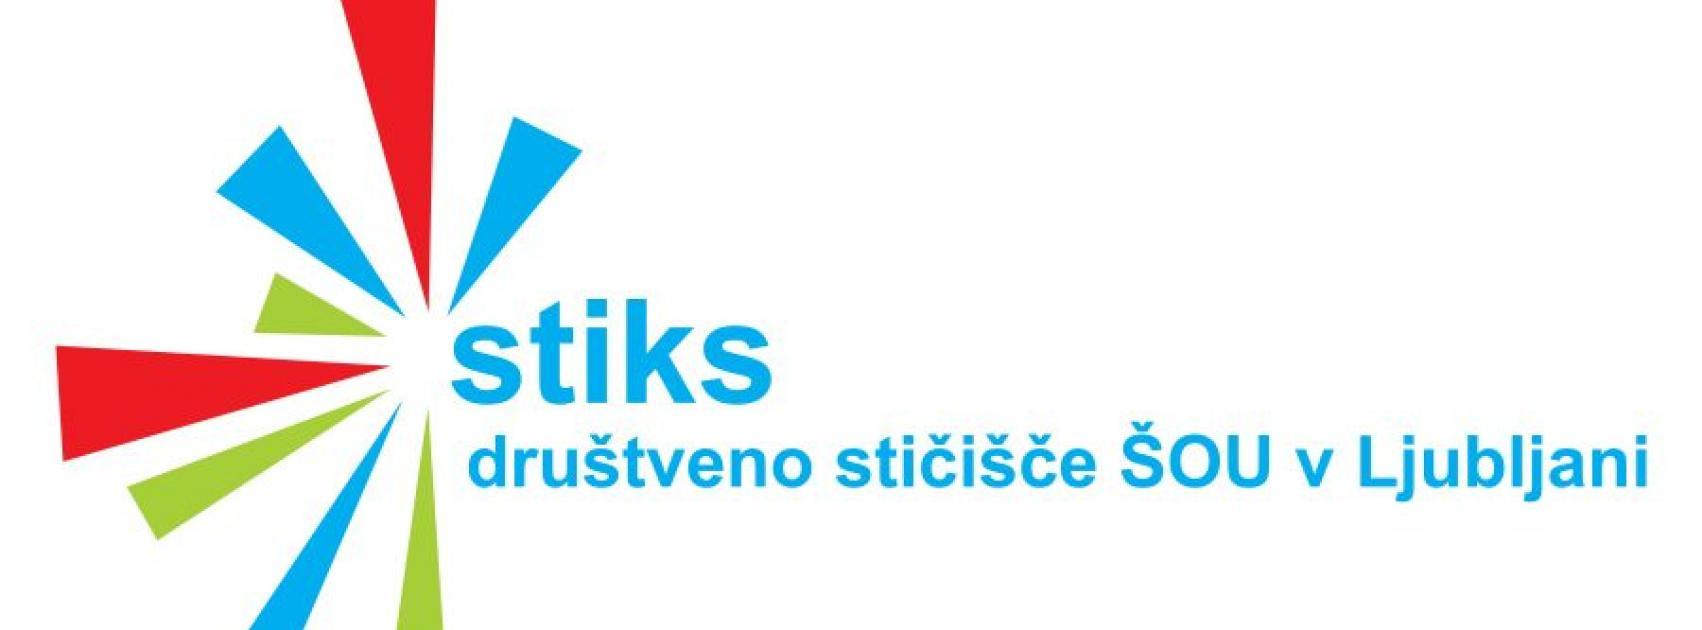 stiks_0.jpg